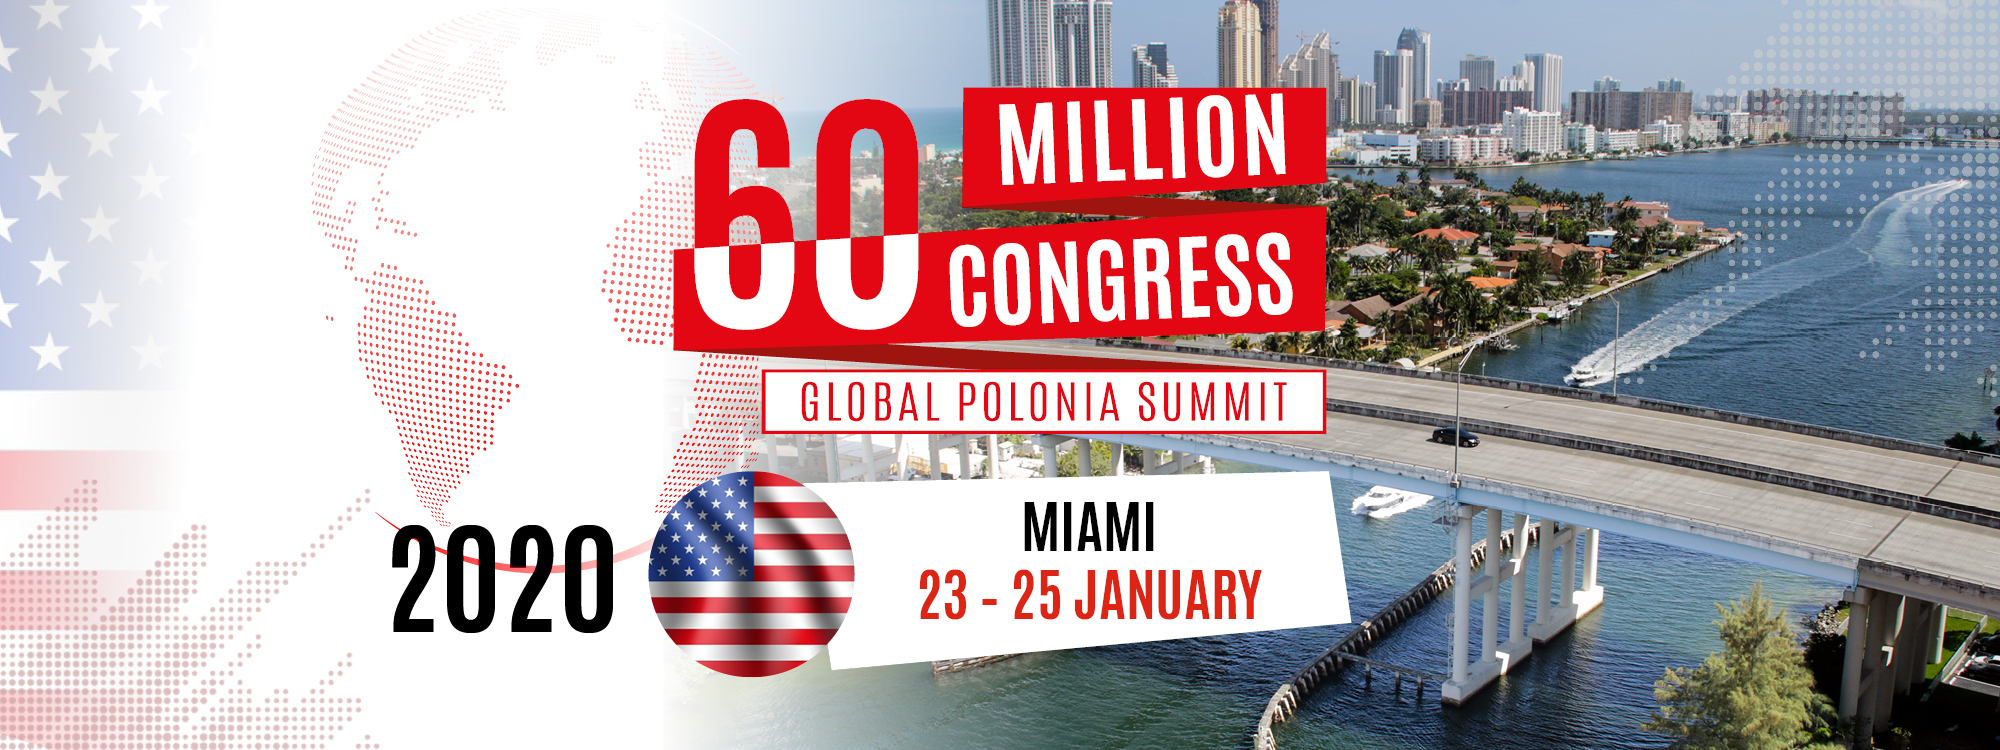 Global Polonia Summit 2020 in Miami